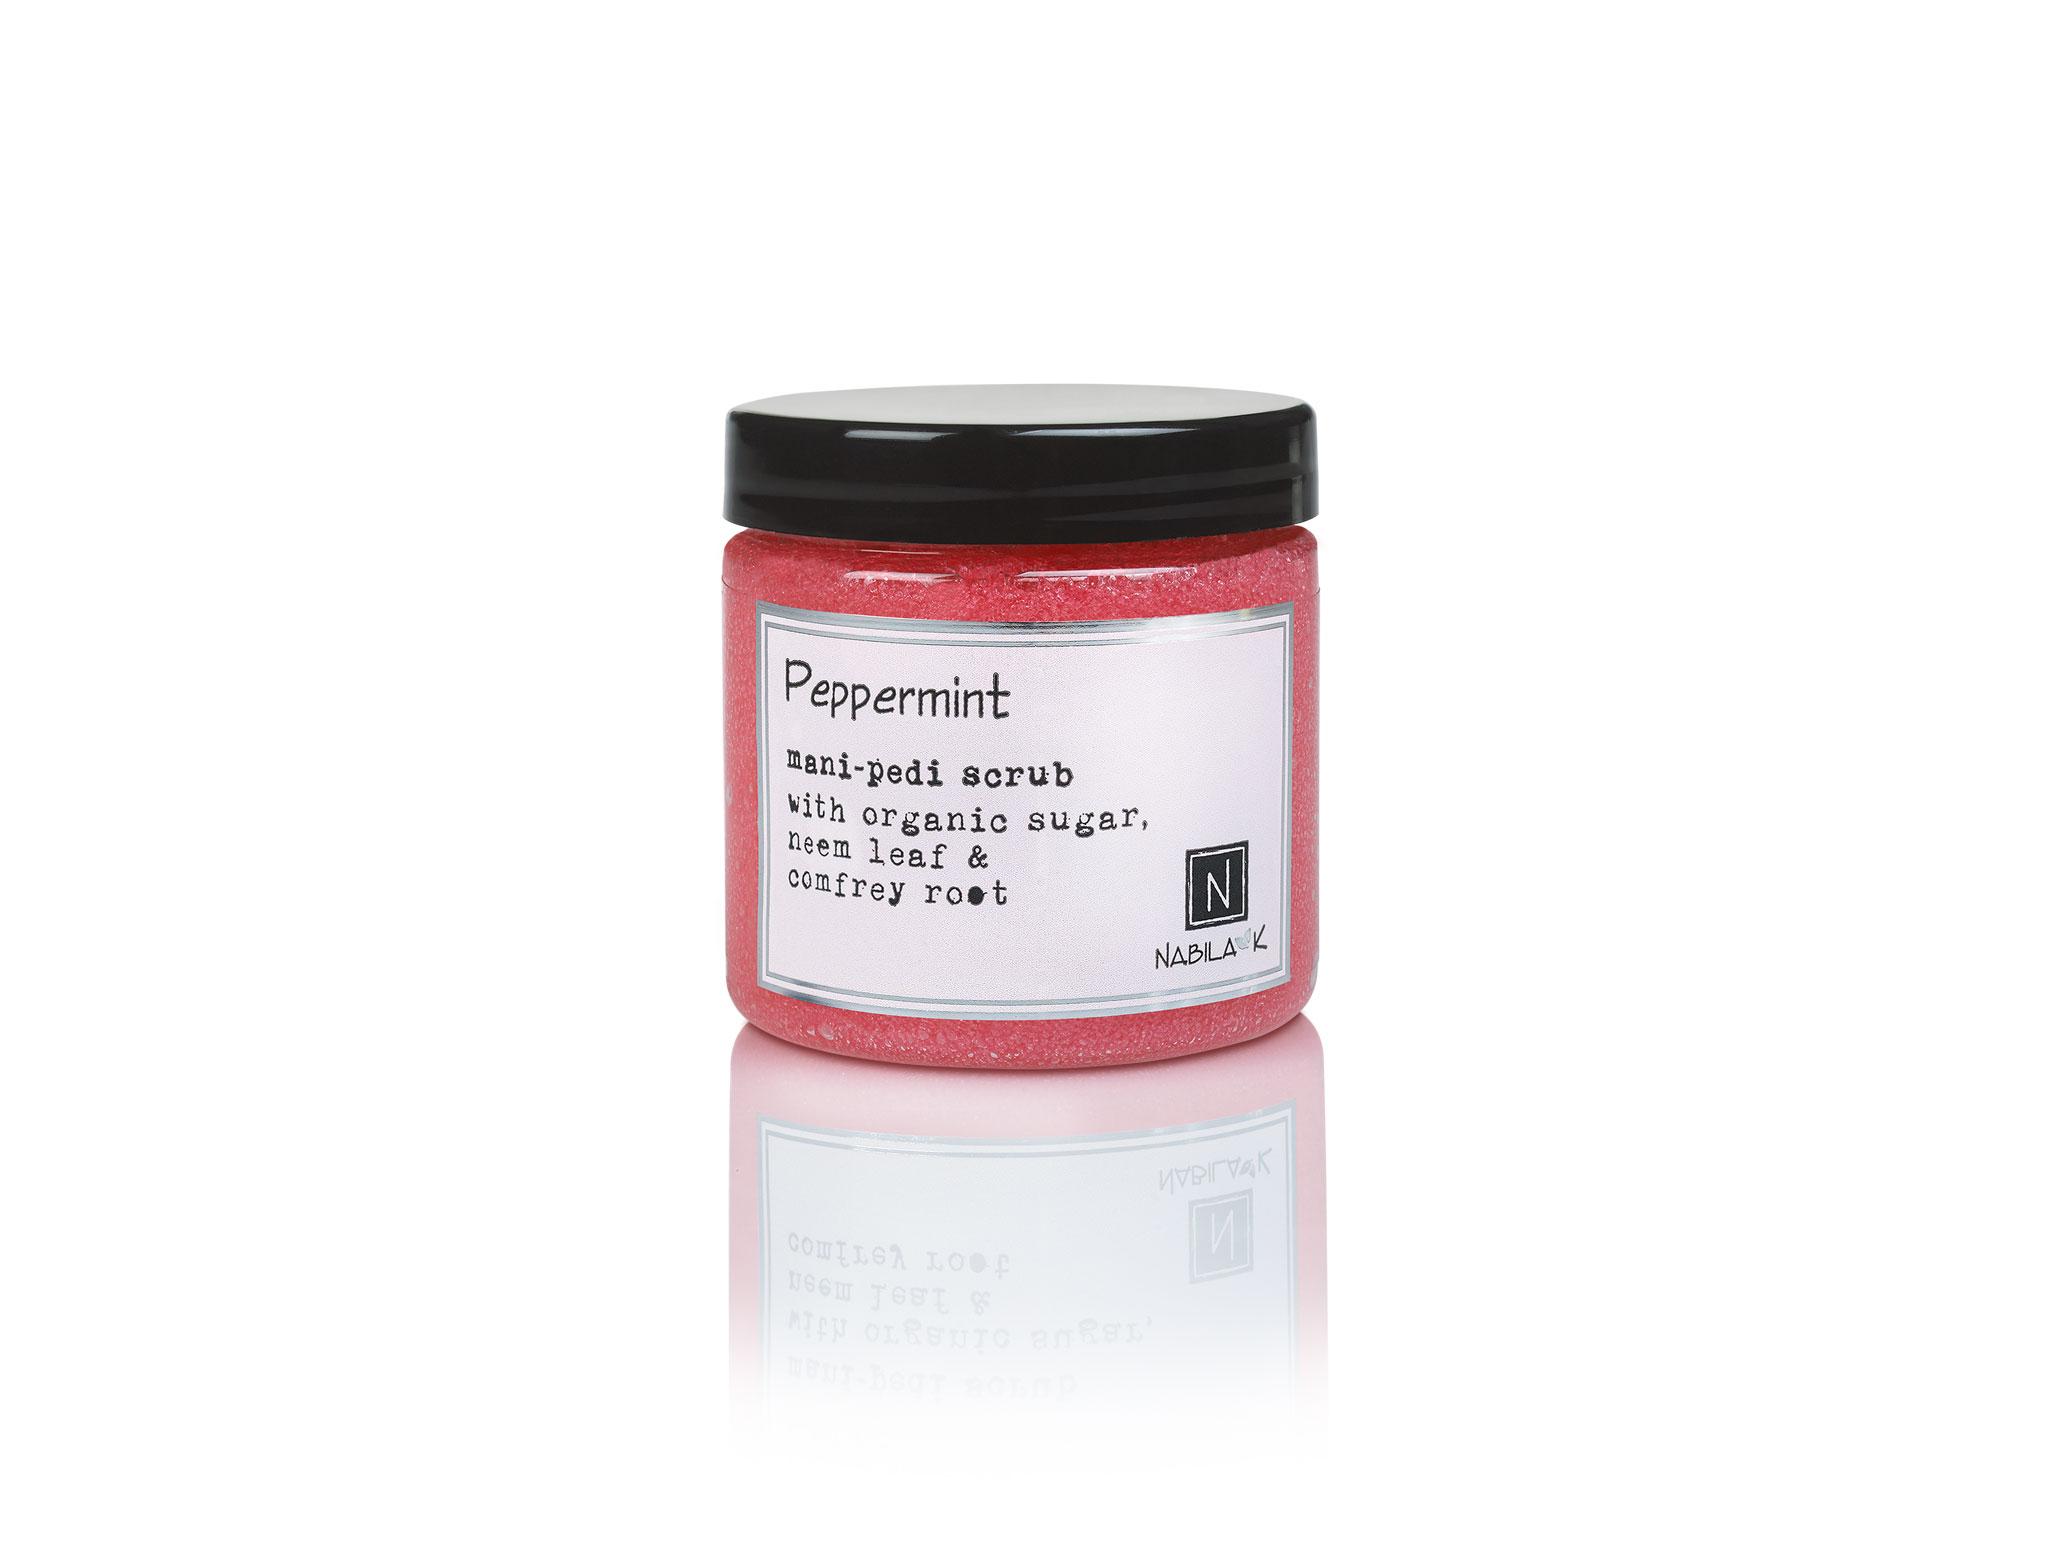 1 Jar of Nabila K's Peppermint Mani-Pedi Scrub with Organic Sugar, Neem Leaf and Comfrey Root